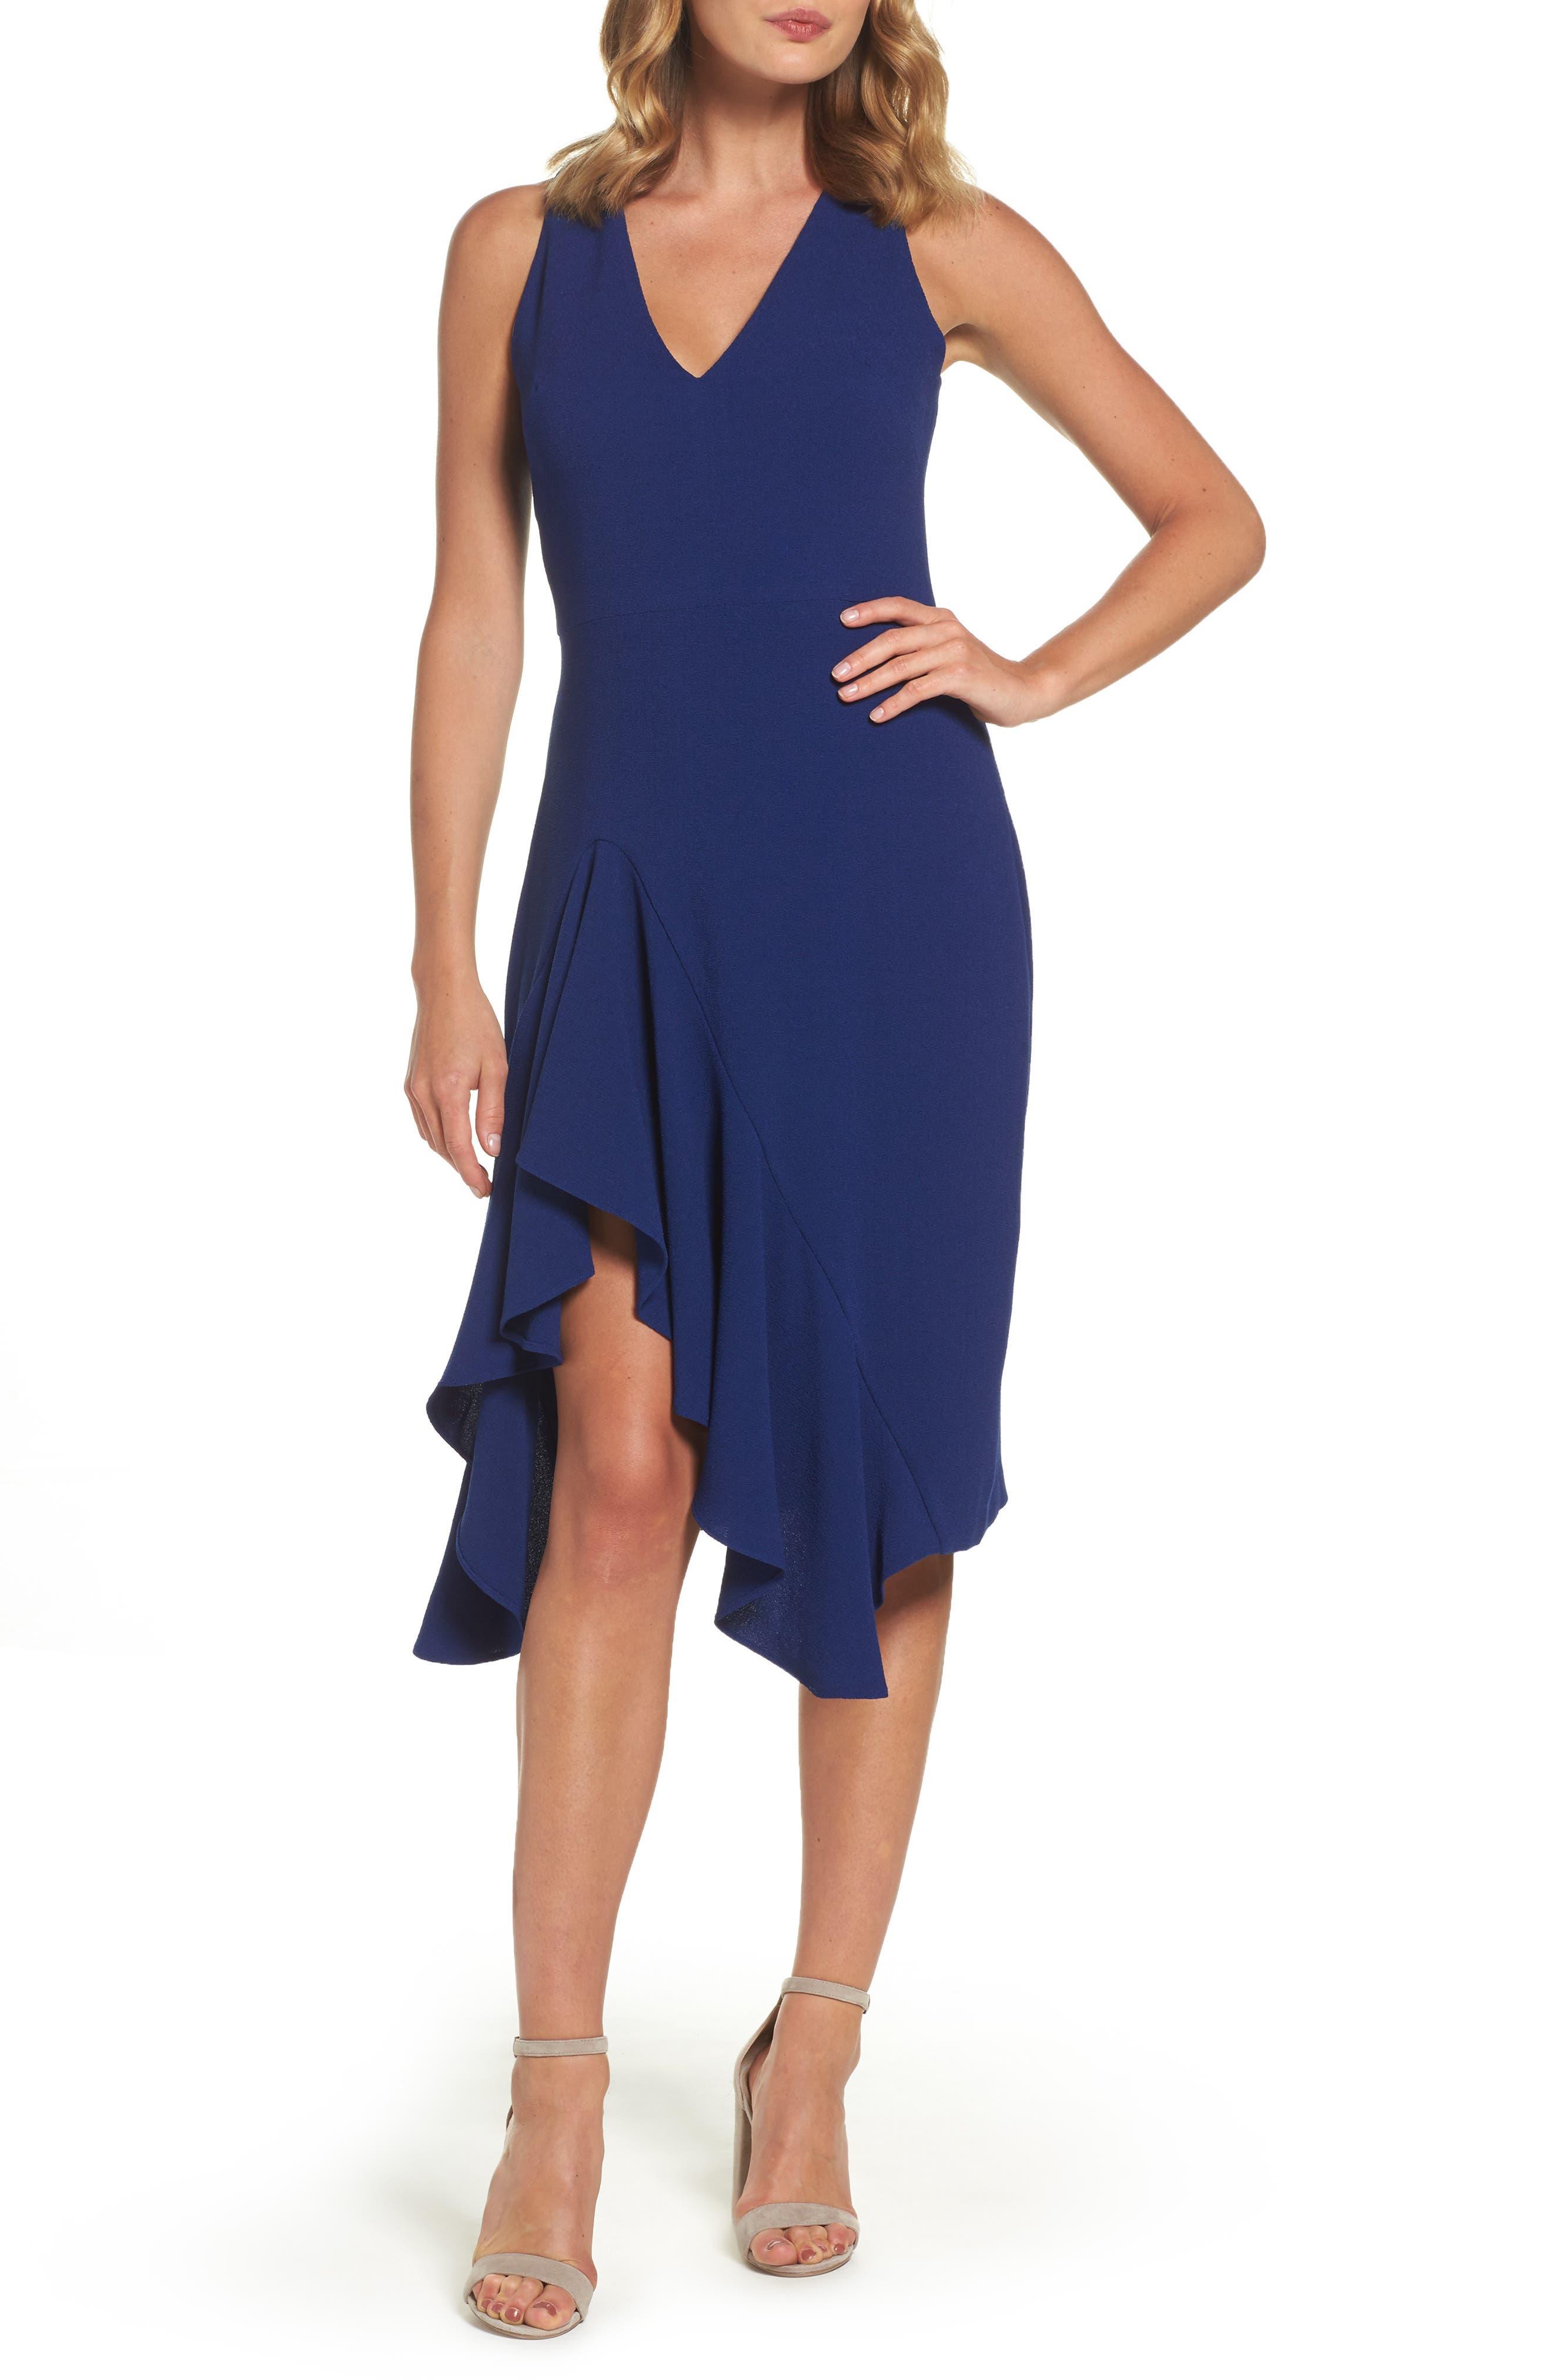 Betsey Johnson Stretch Crepe A-Line Dress